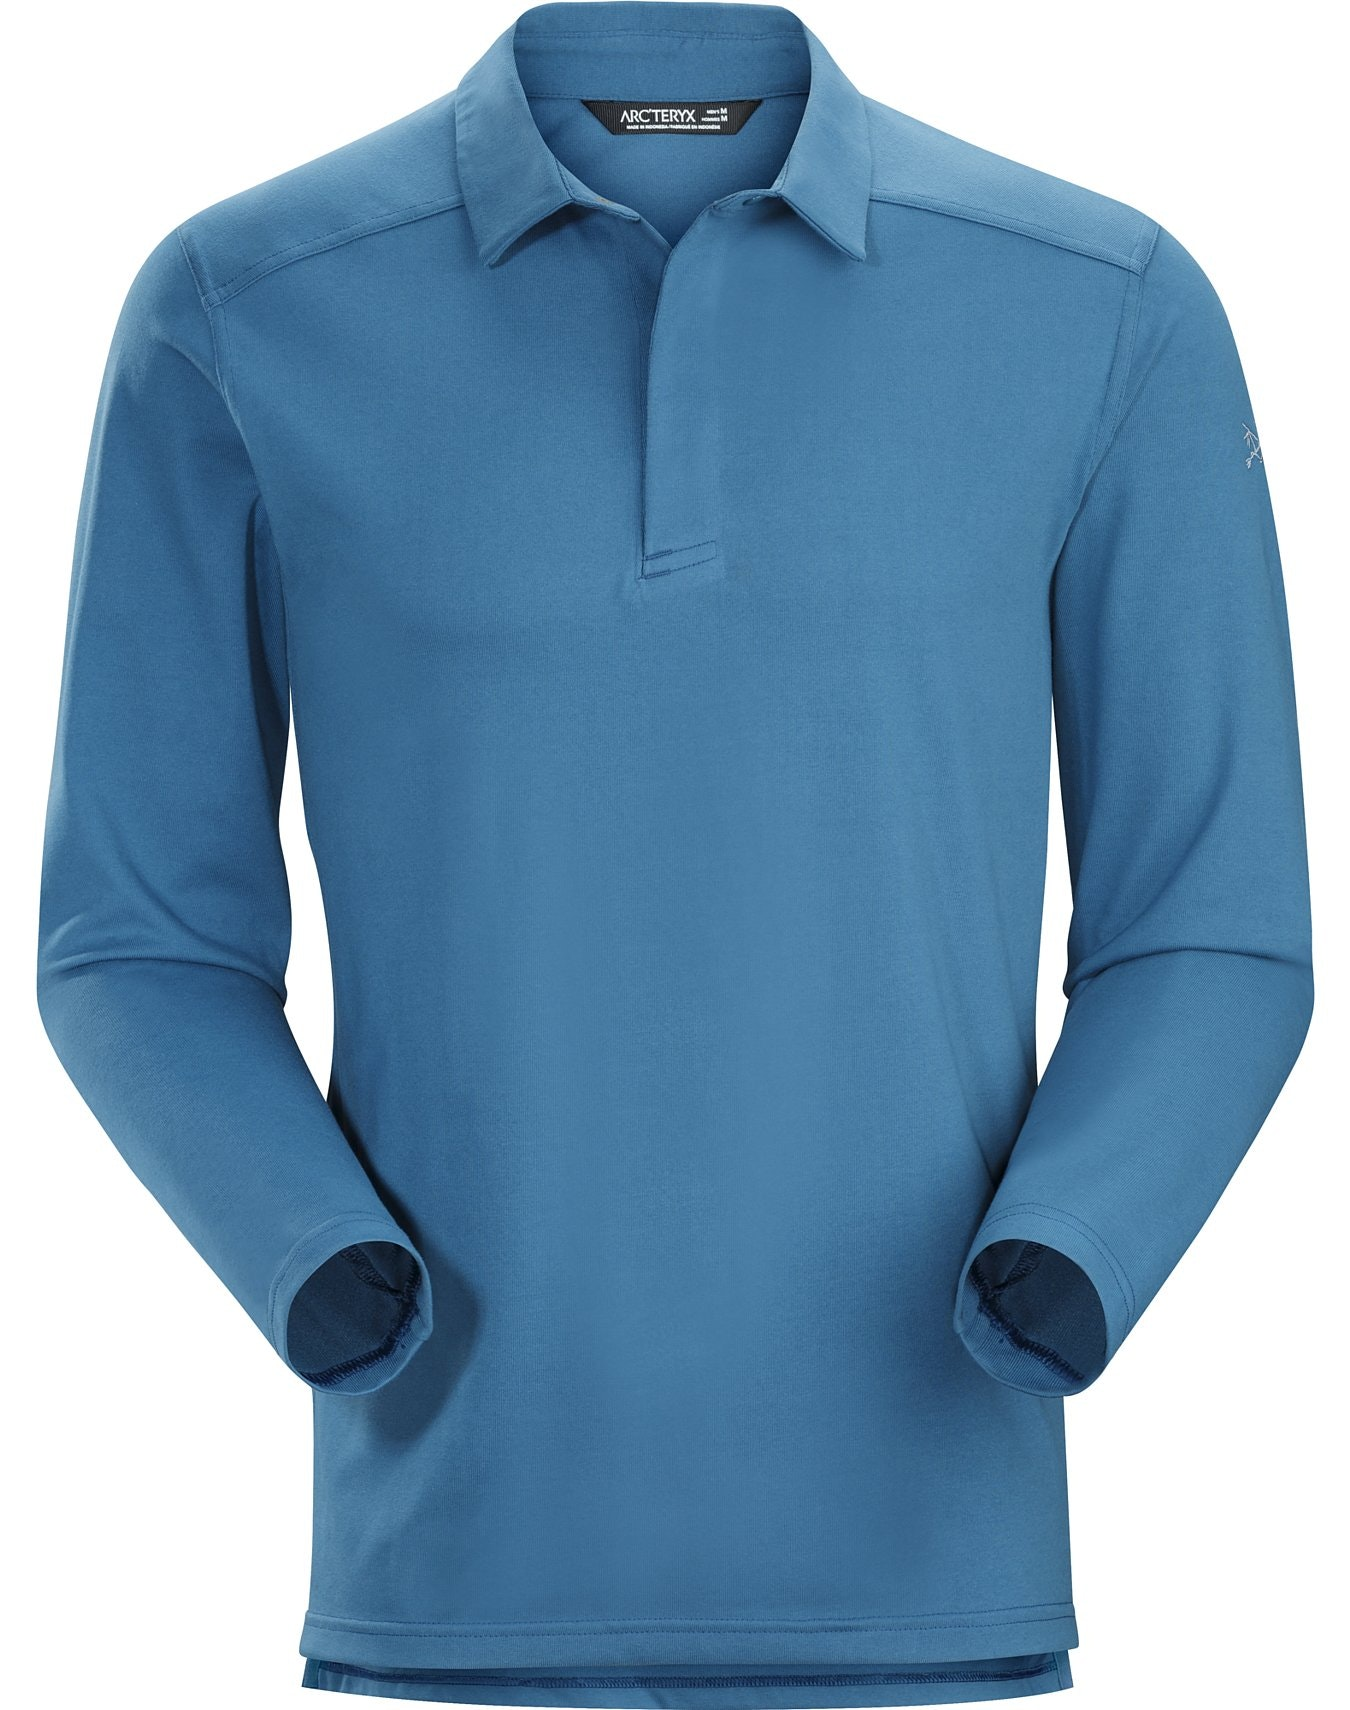 Captive Polo Shirt Ls Mens Arcteryx